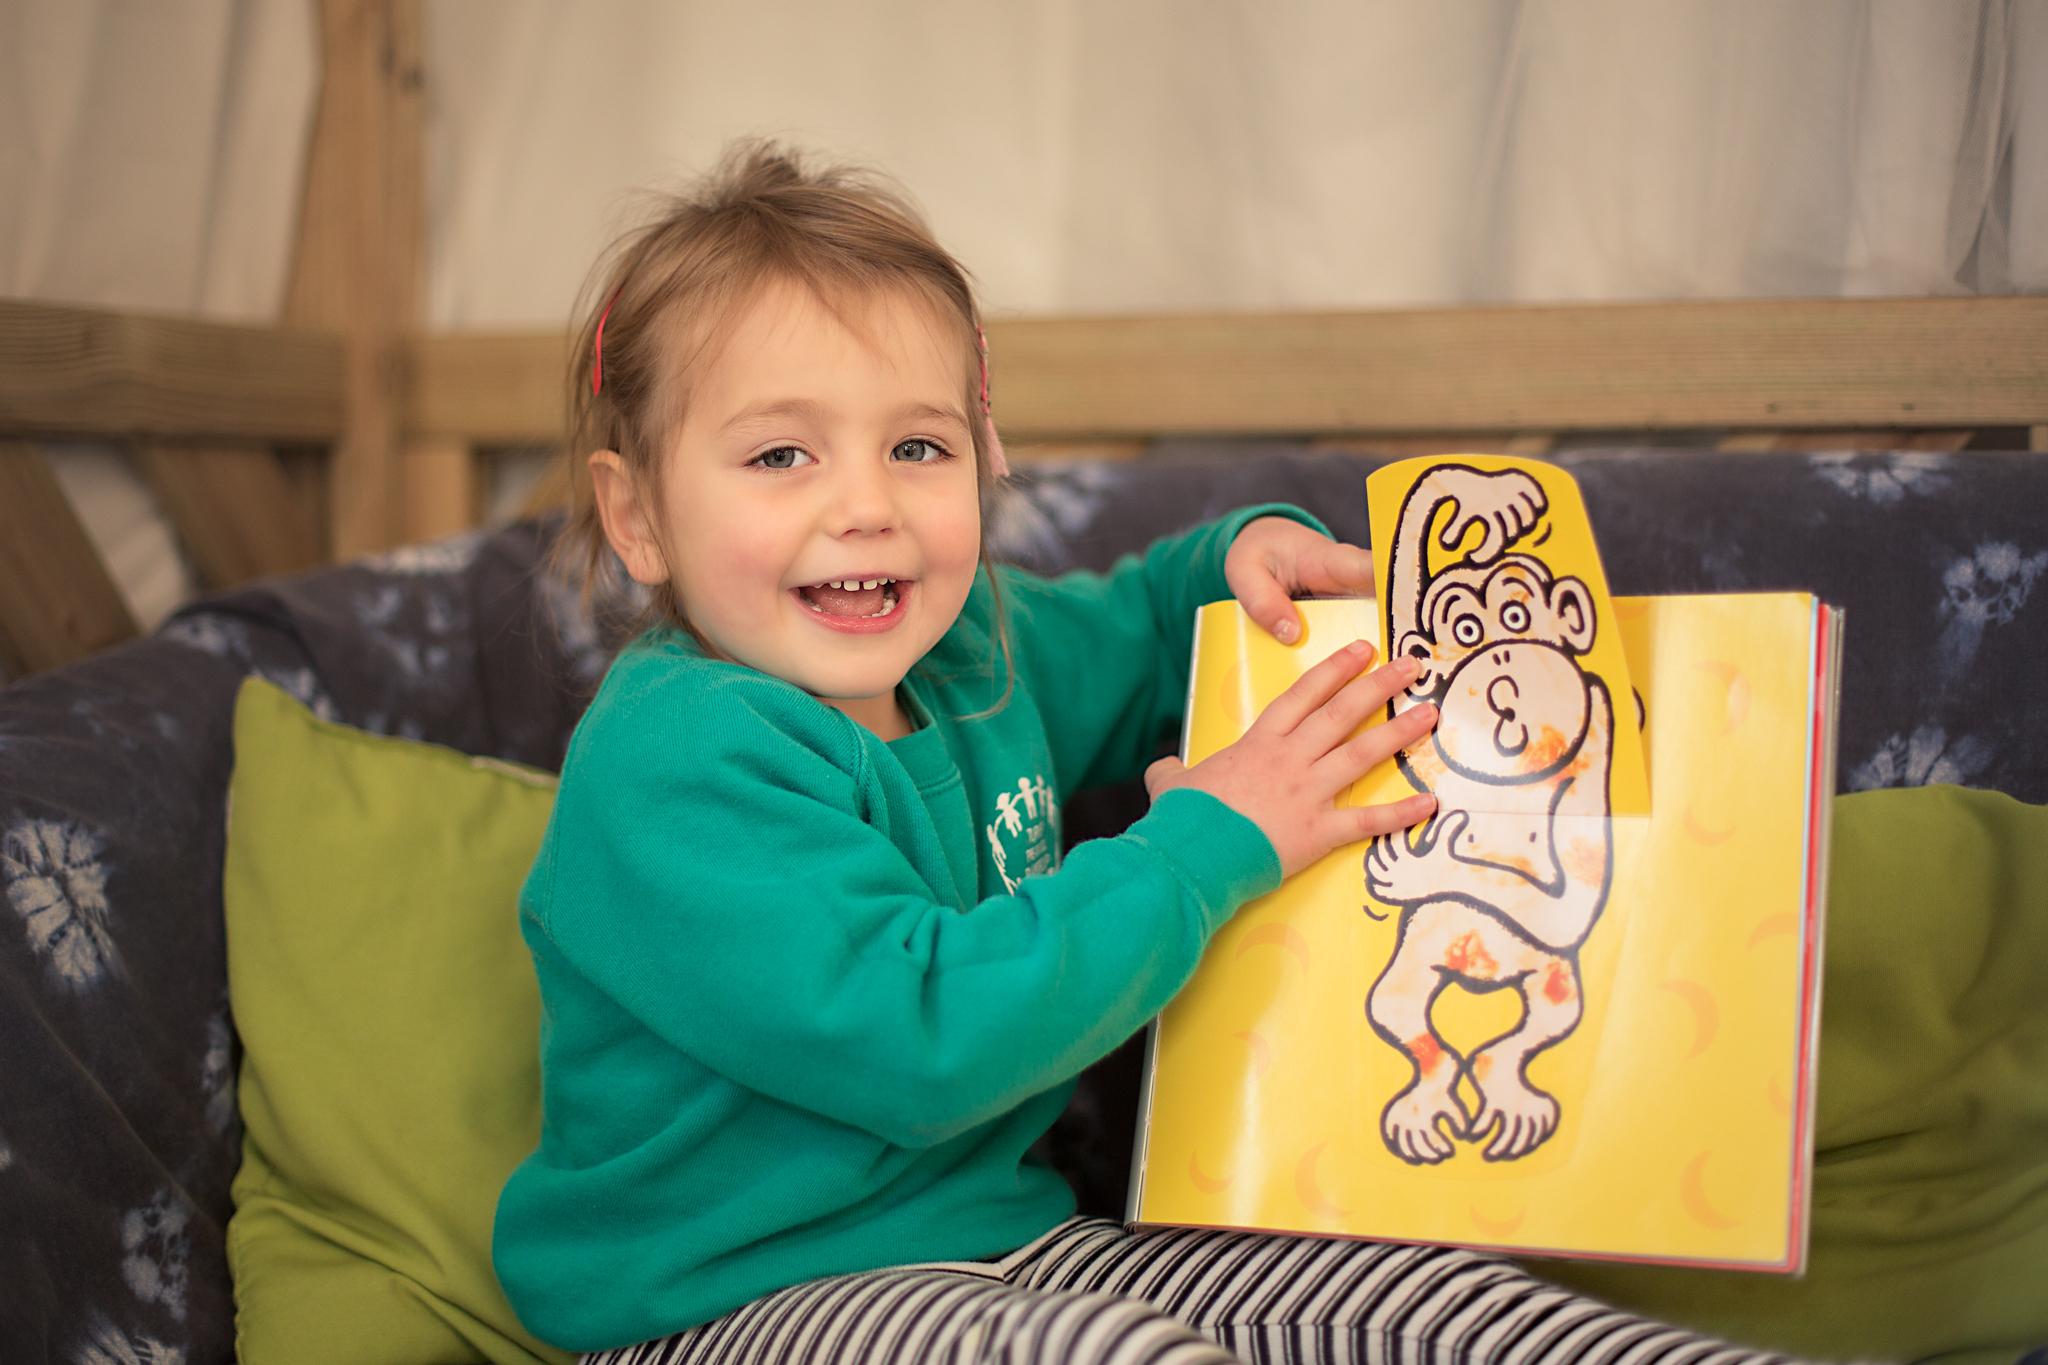 Bedford Photographer - Turvey Preschool Photos.jpg